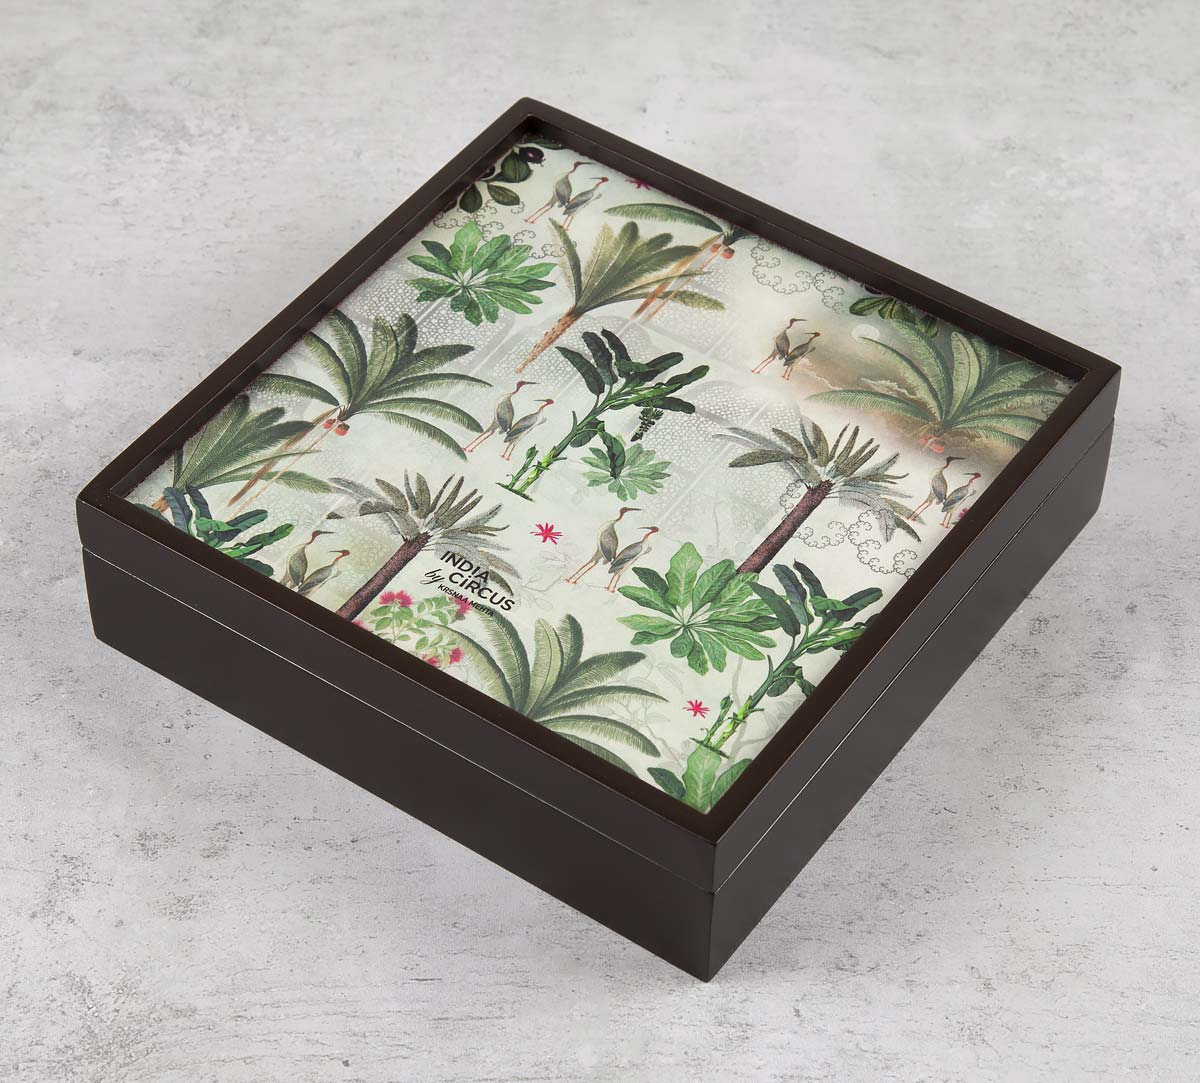 Heron's Garden Small Storage Box